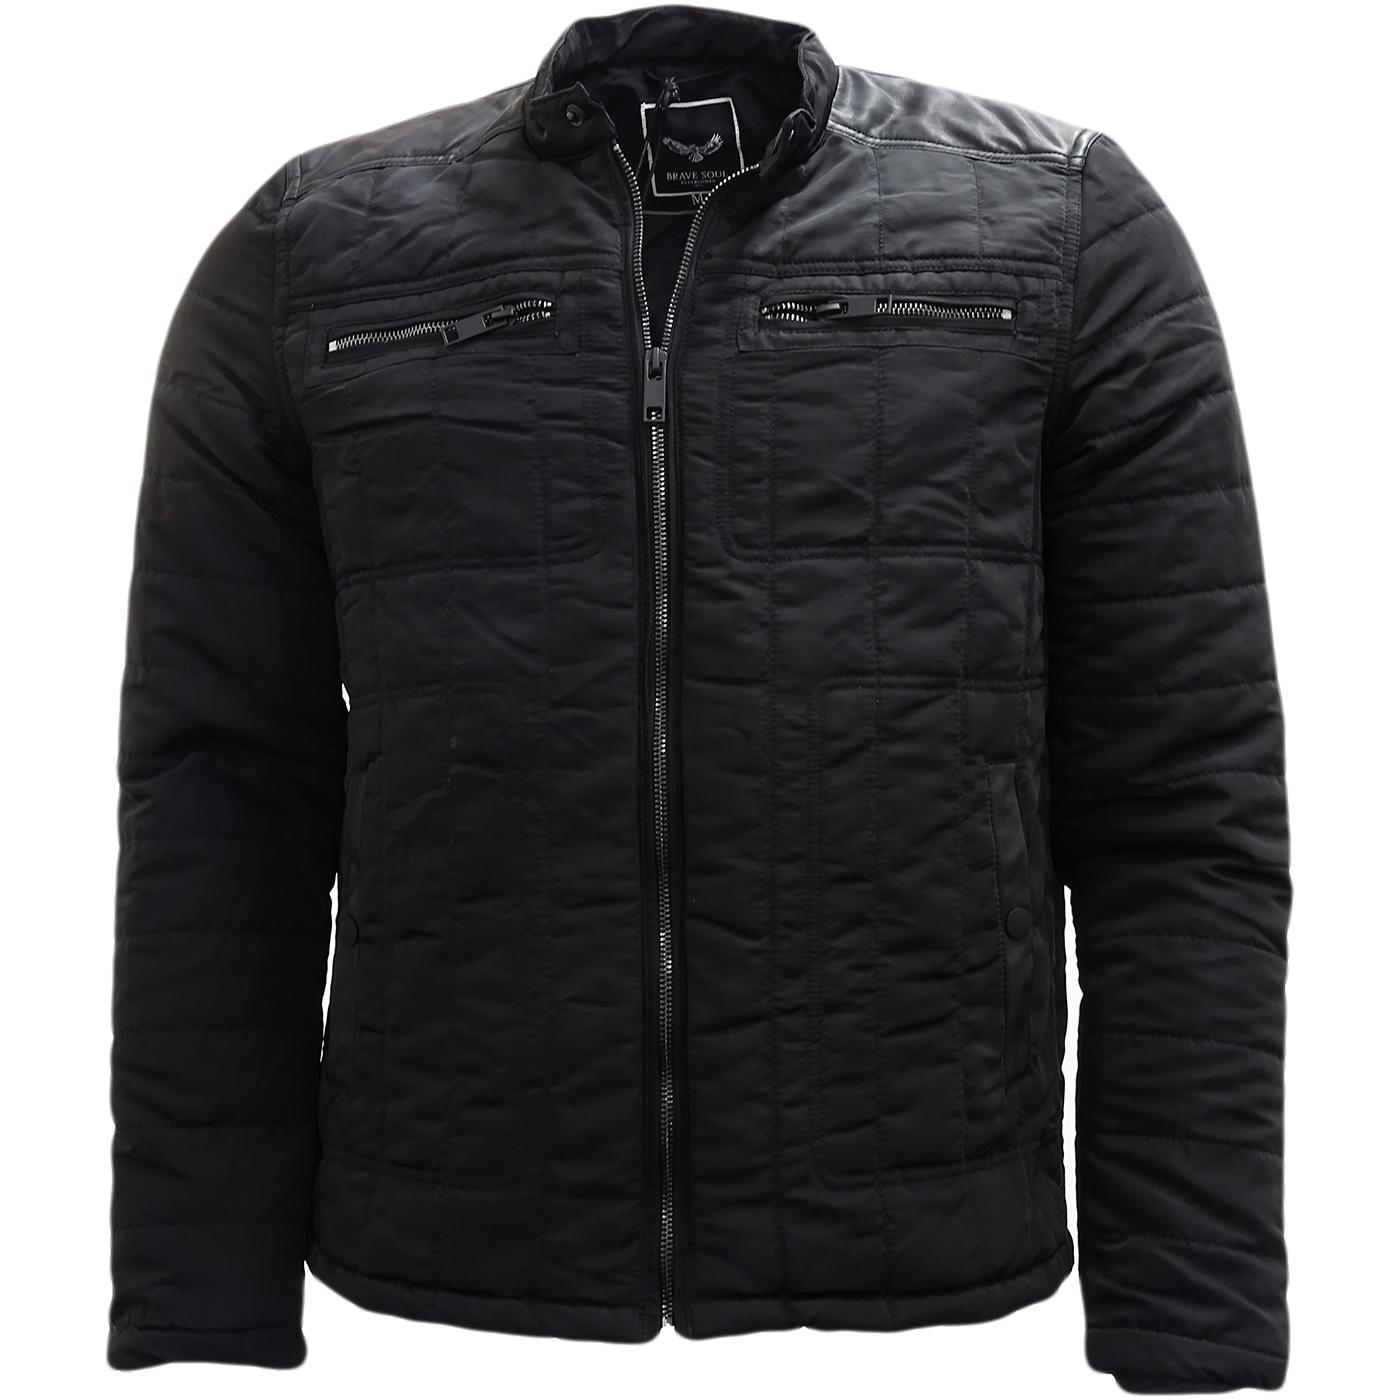 Brave Soul Black Jacket / Outerwear Coat